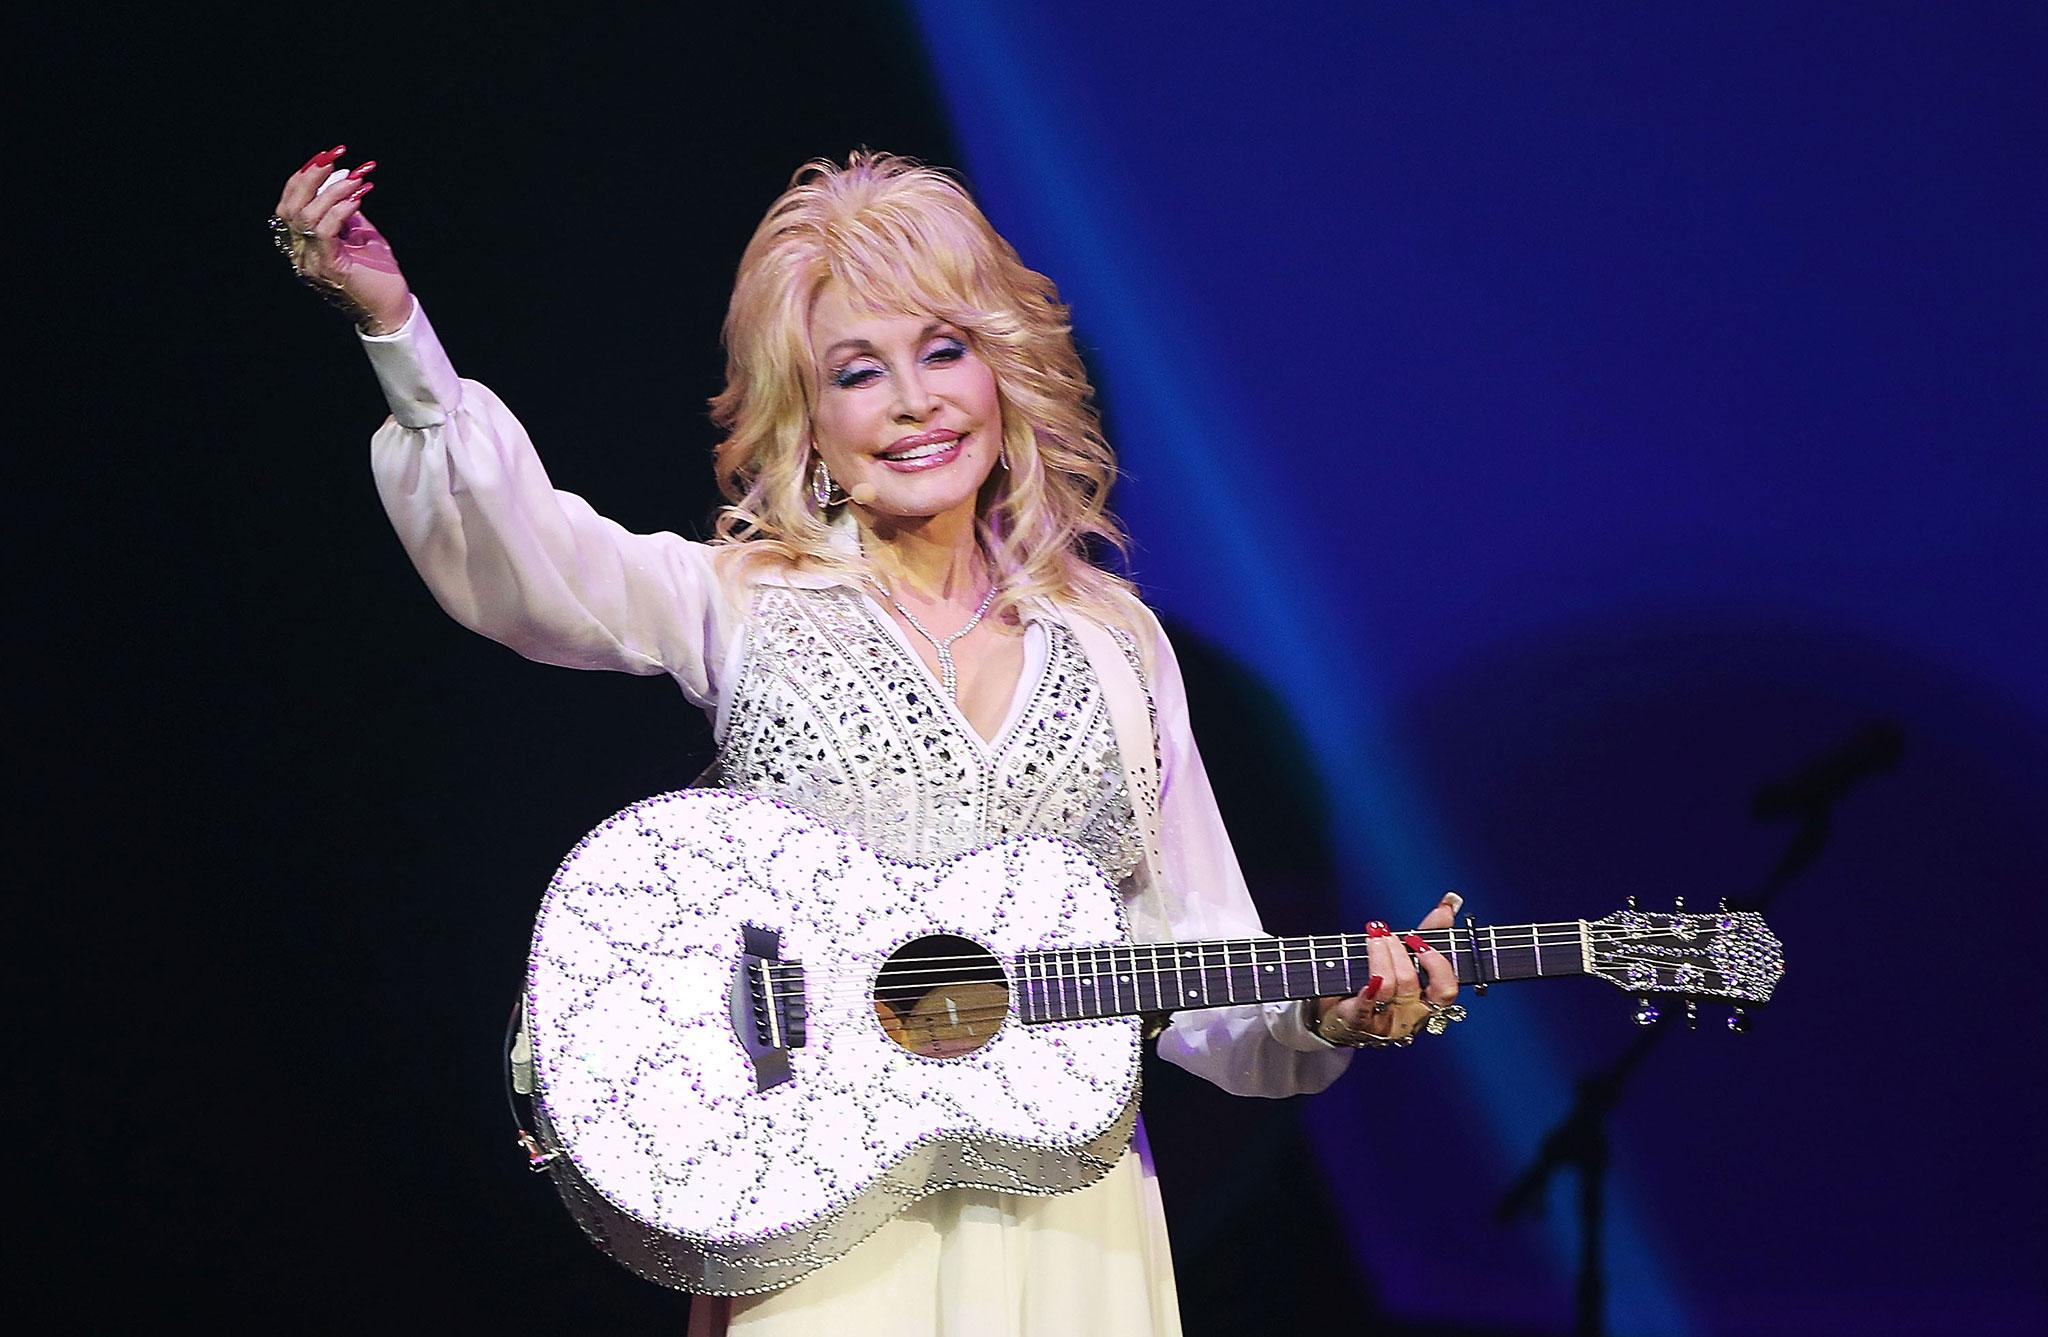 Wenn sich Dolly Parton im Kreis dreht